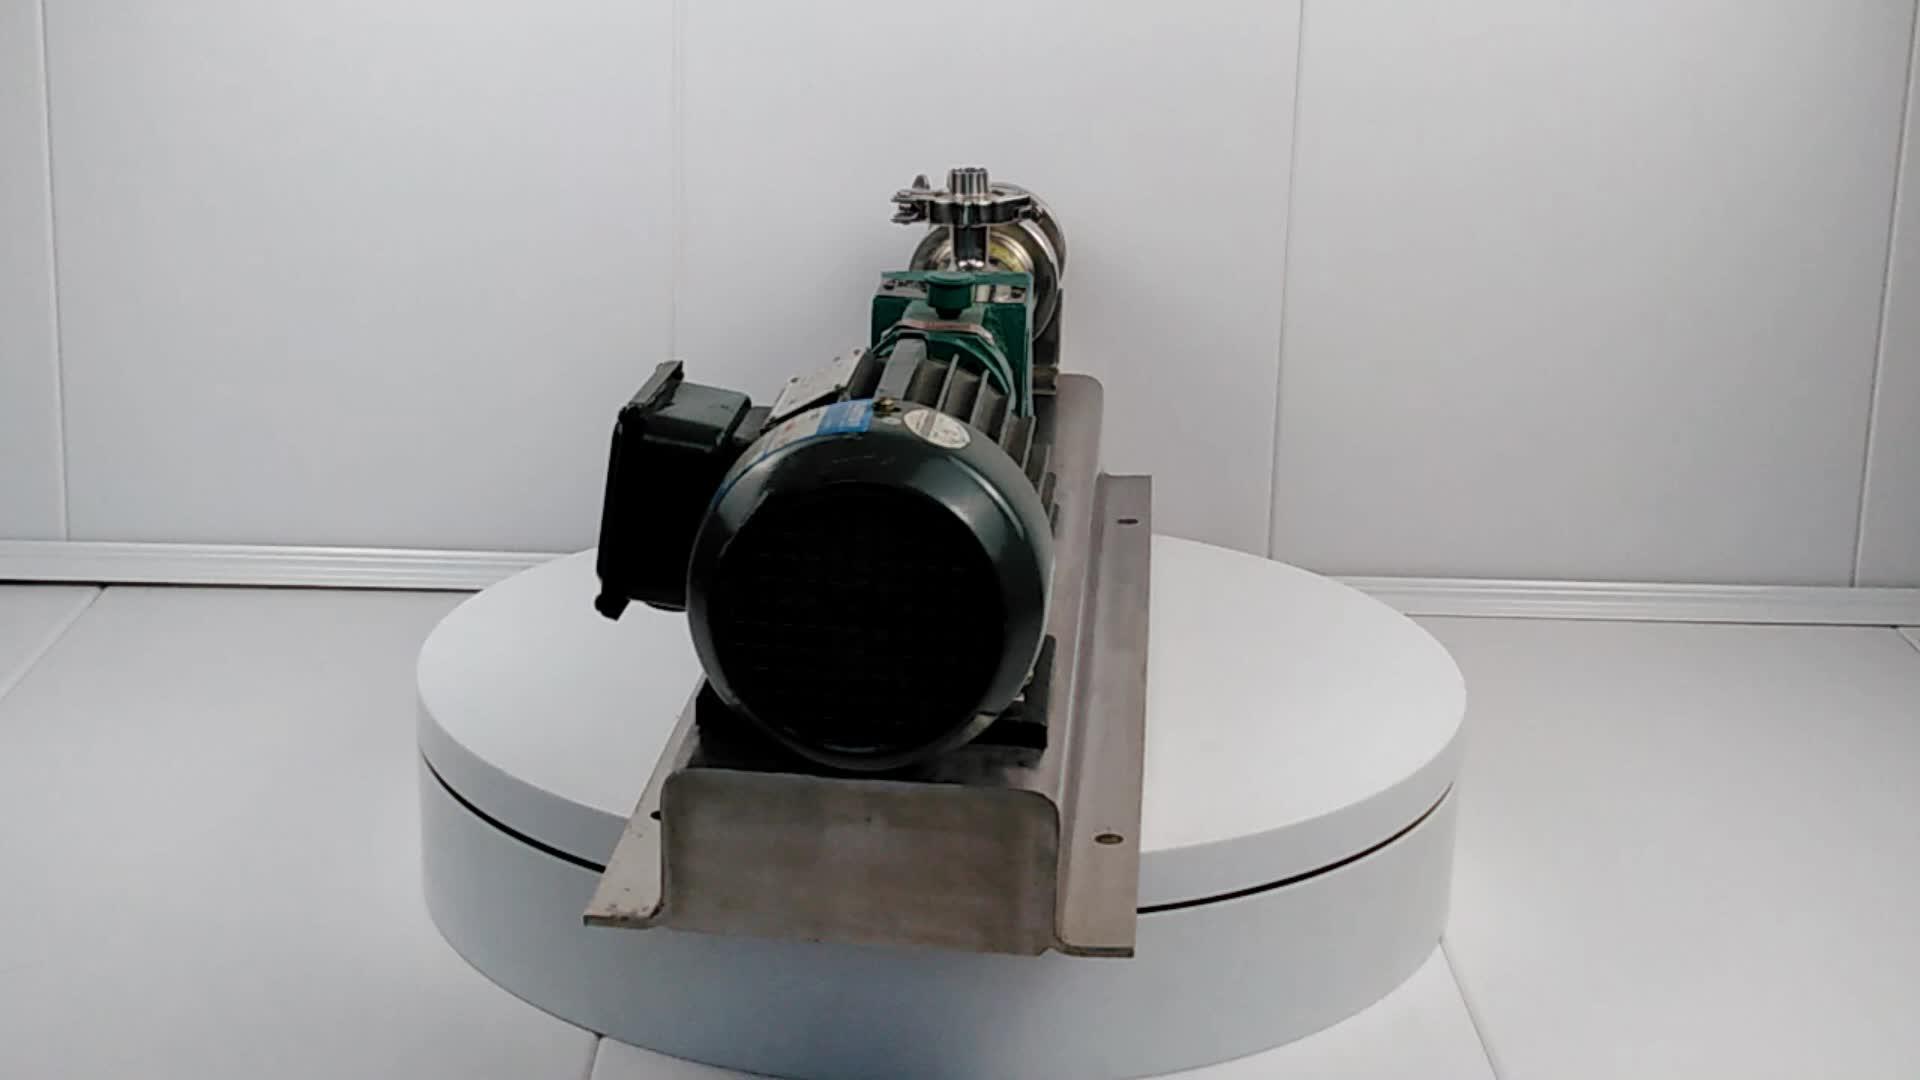 Stainless steel open hopper screw pump progressive cavity pump for tomato paste